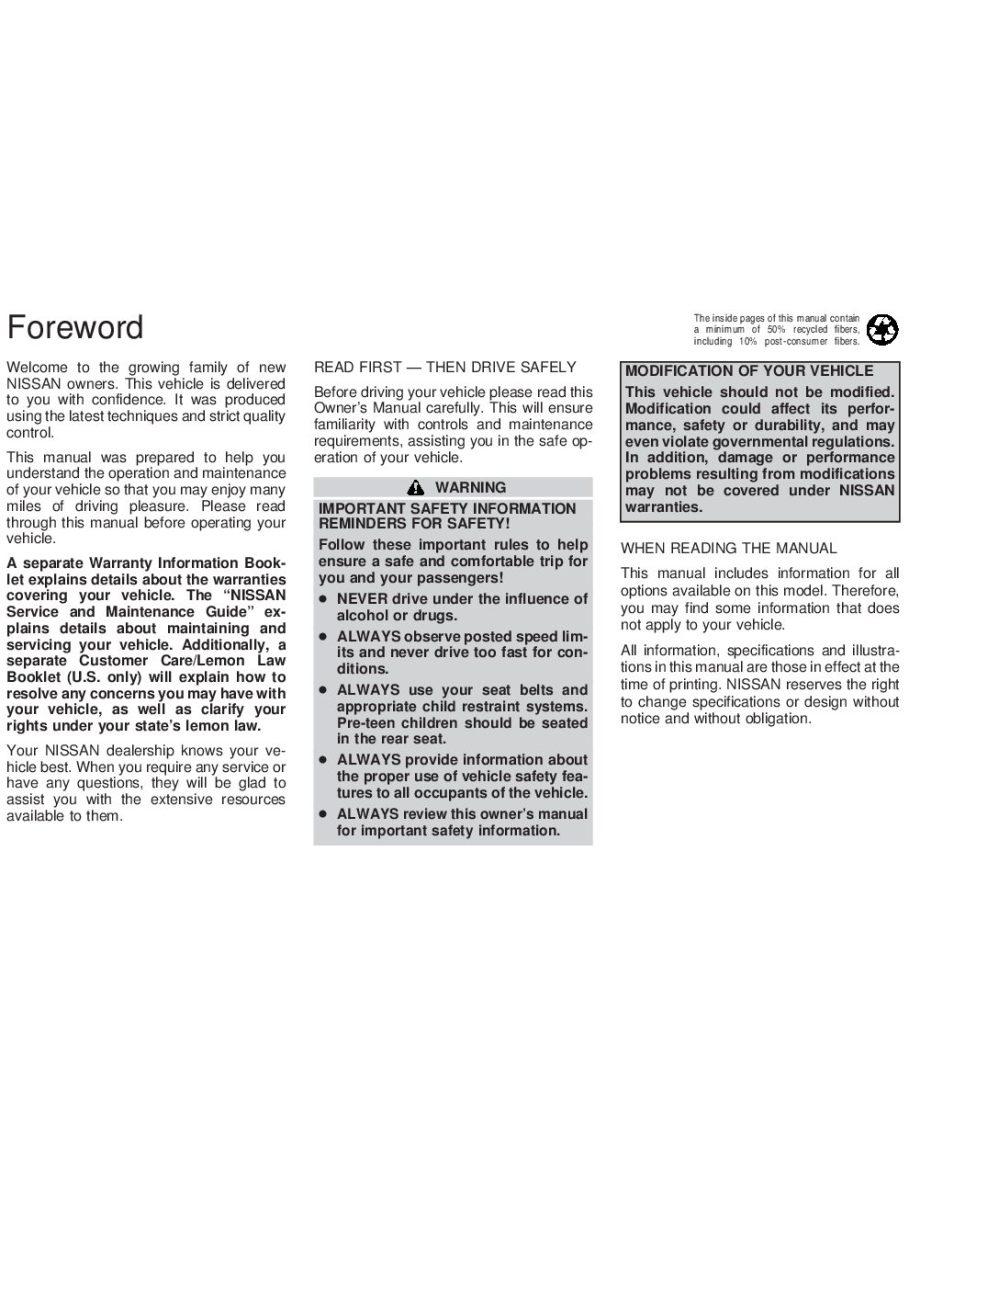 medium resolution of 2002 nissan altima owner s manual